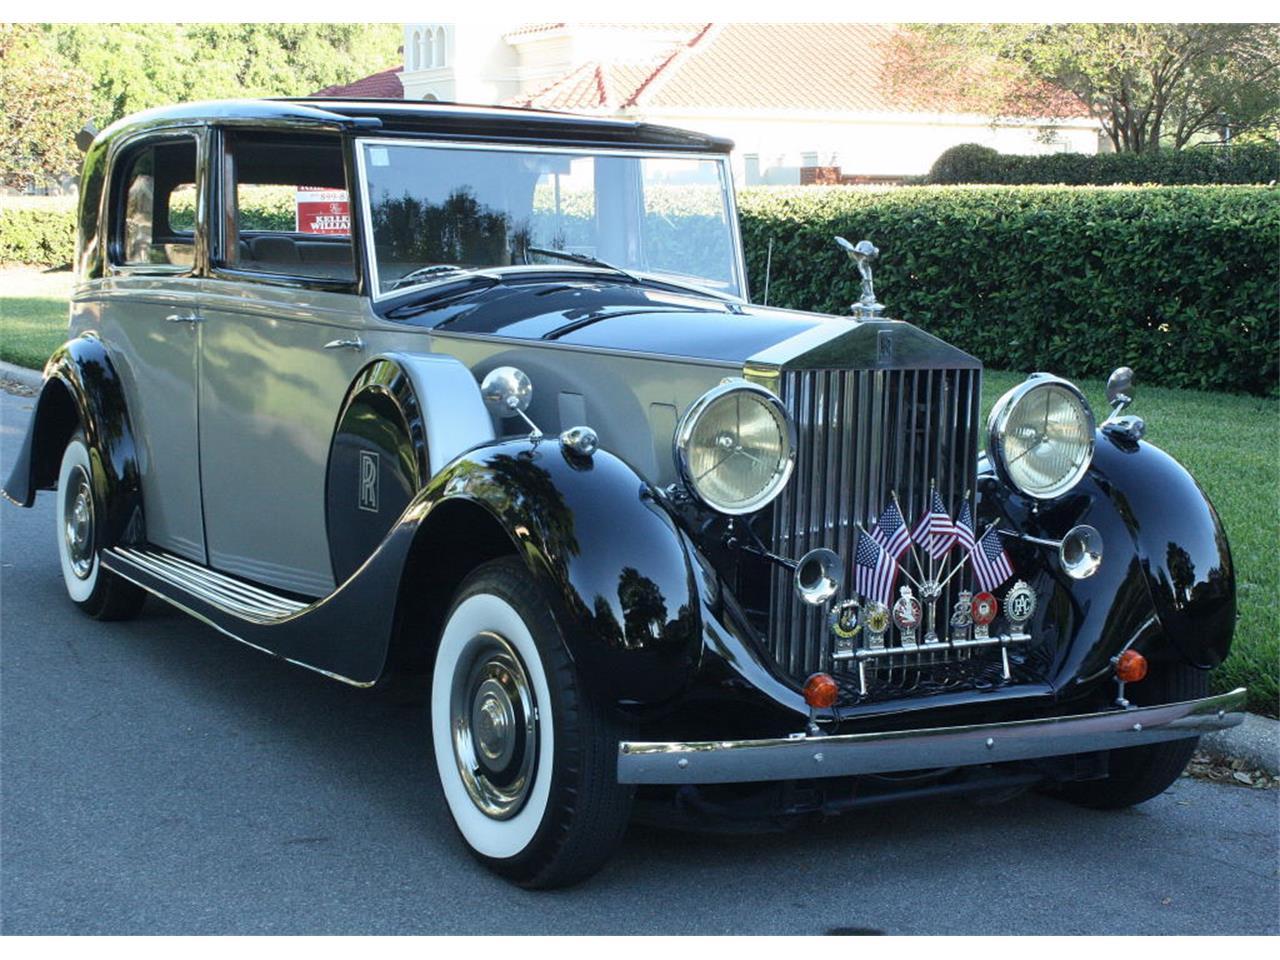 1938 Rolls-Royce Phantom III for Sale | ClassicCars.com ...